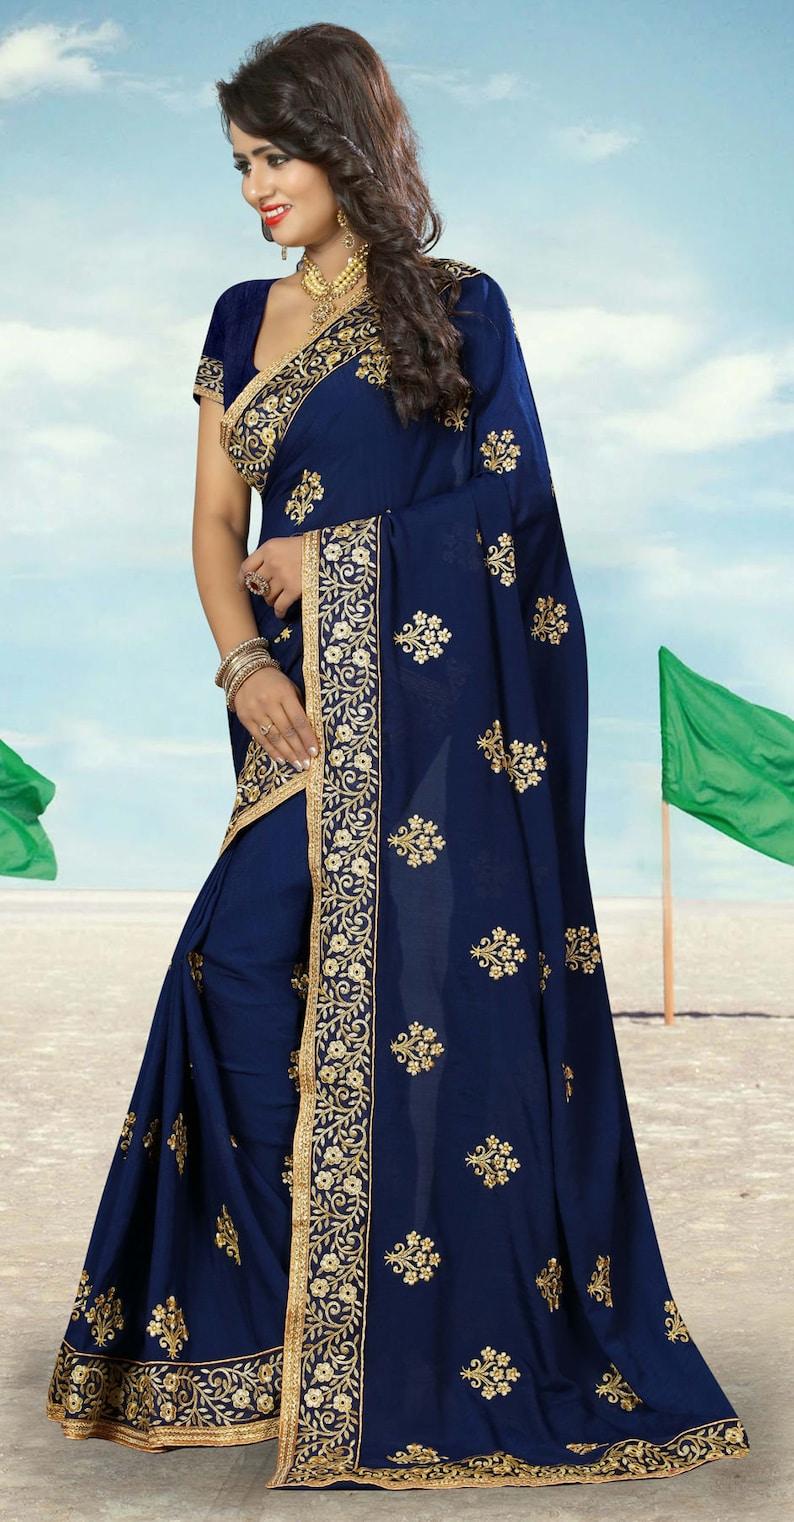 Georgette Party Wear Saree in Blue with Zari work